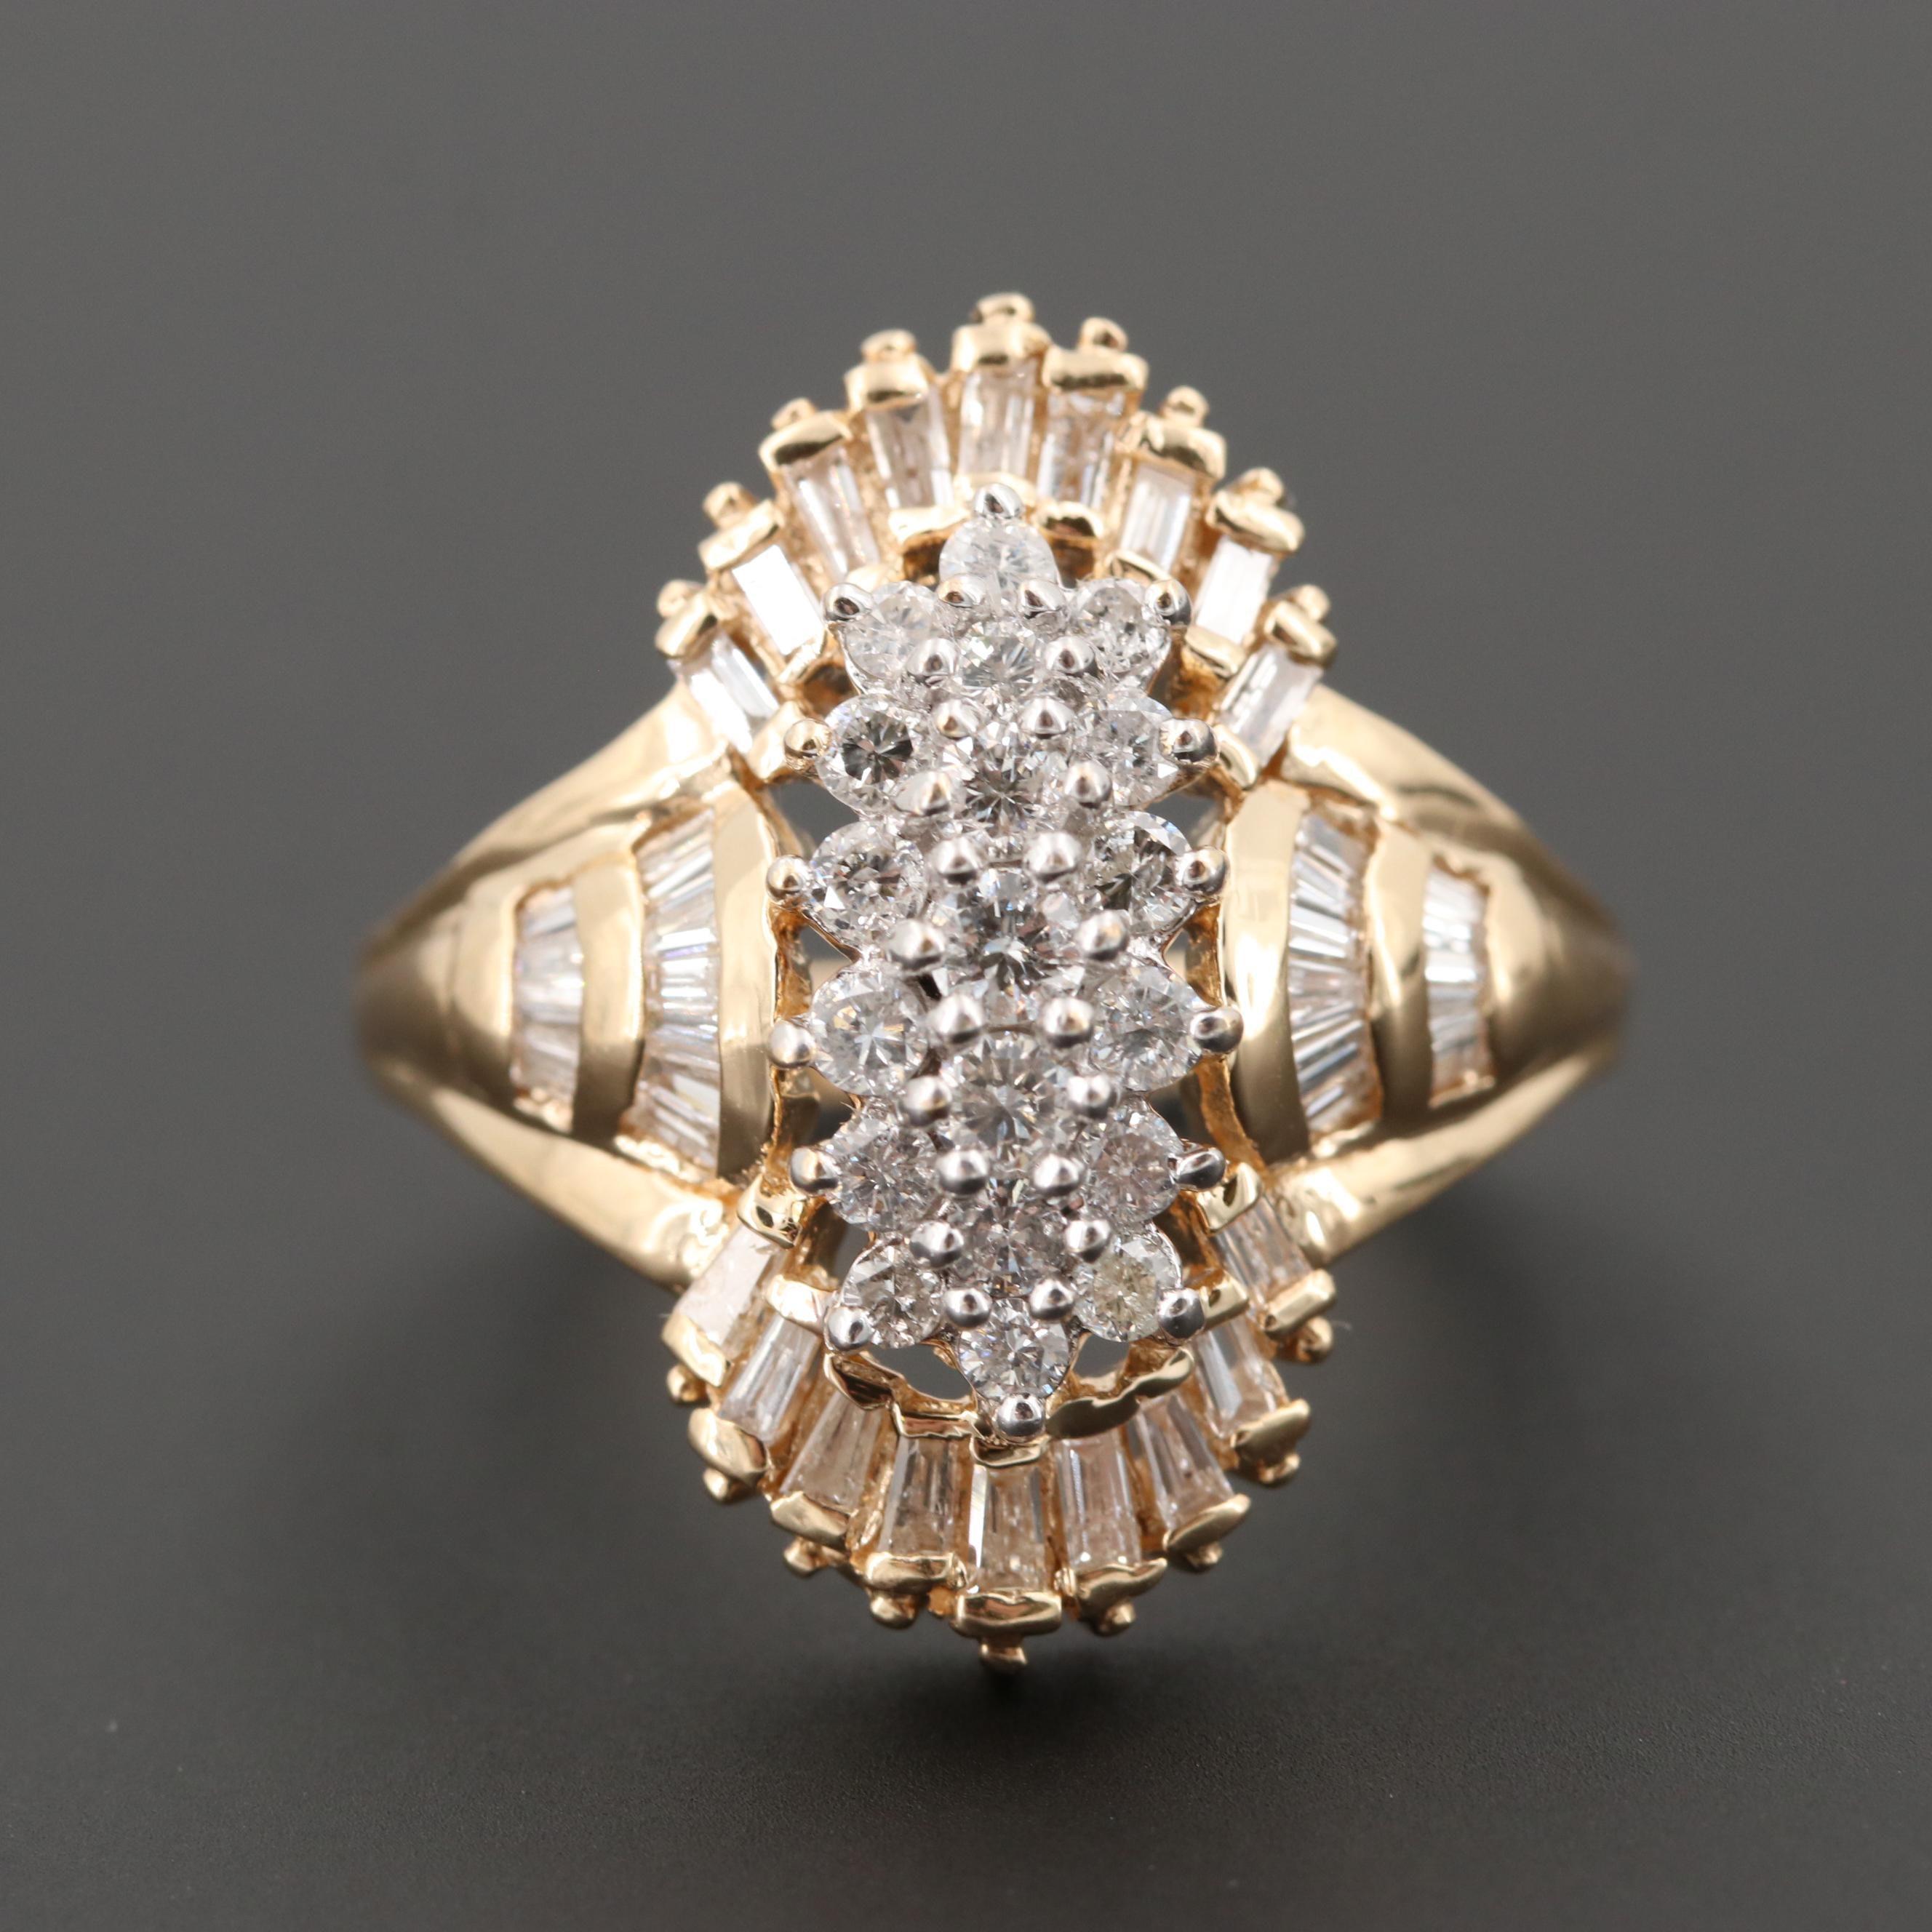 14K Yellow Gold 1.47 CTW Diamond Ring